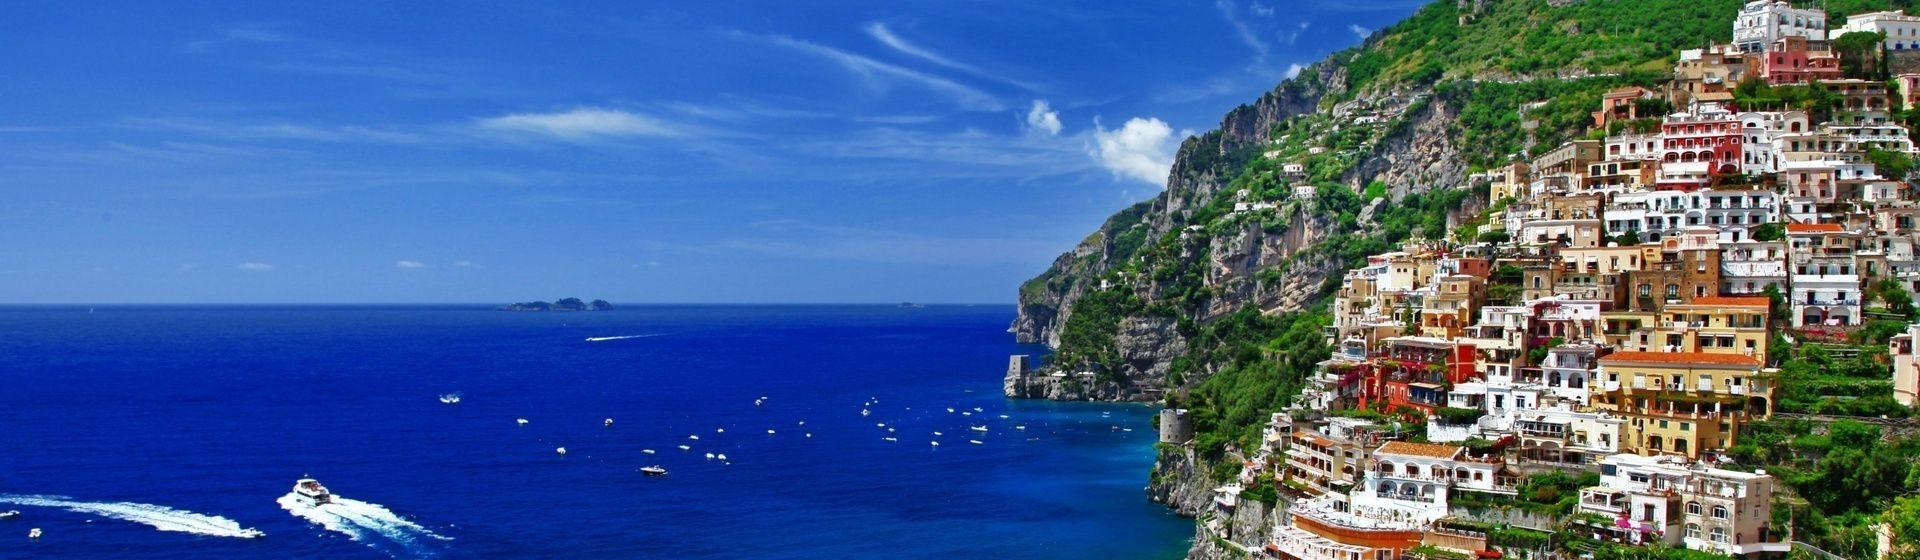 Drivinaples Positano Amalfi Coast  Tour Shore Excurision